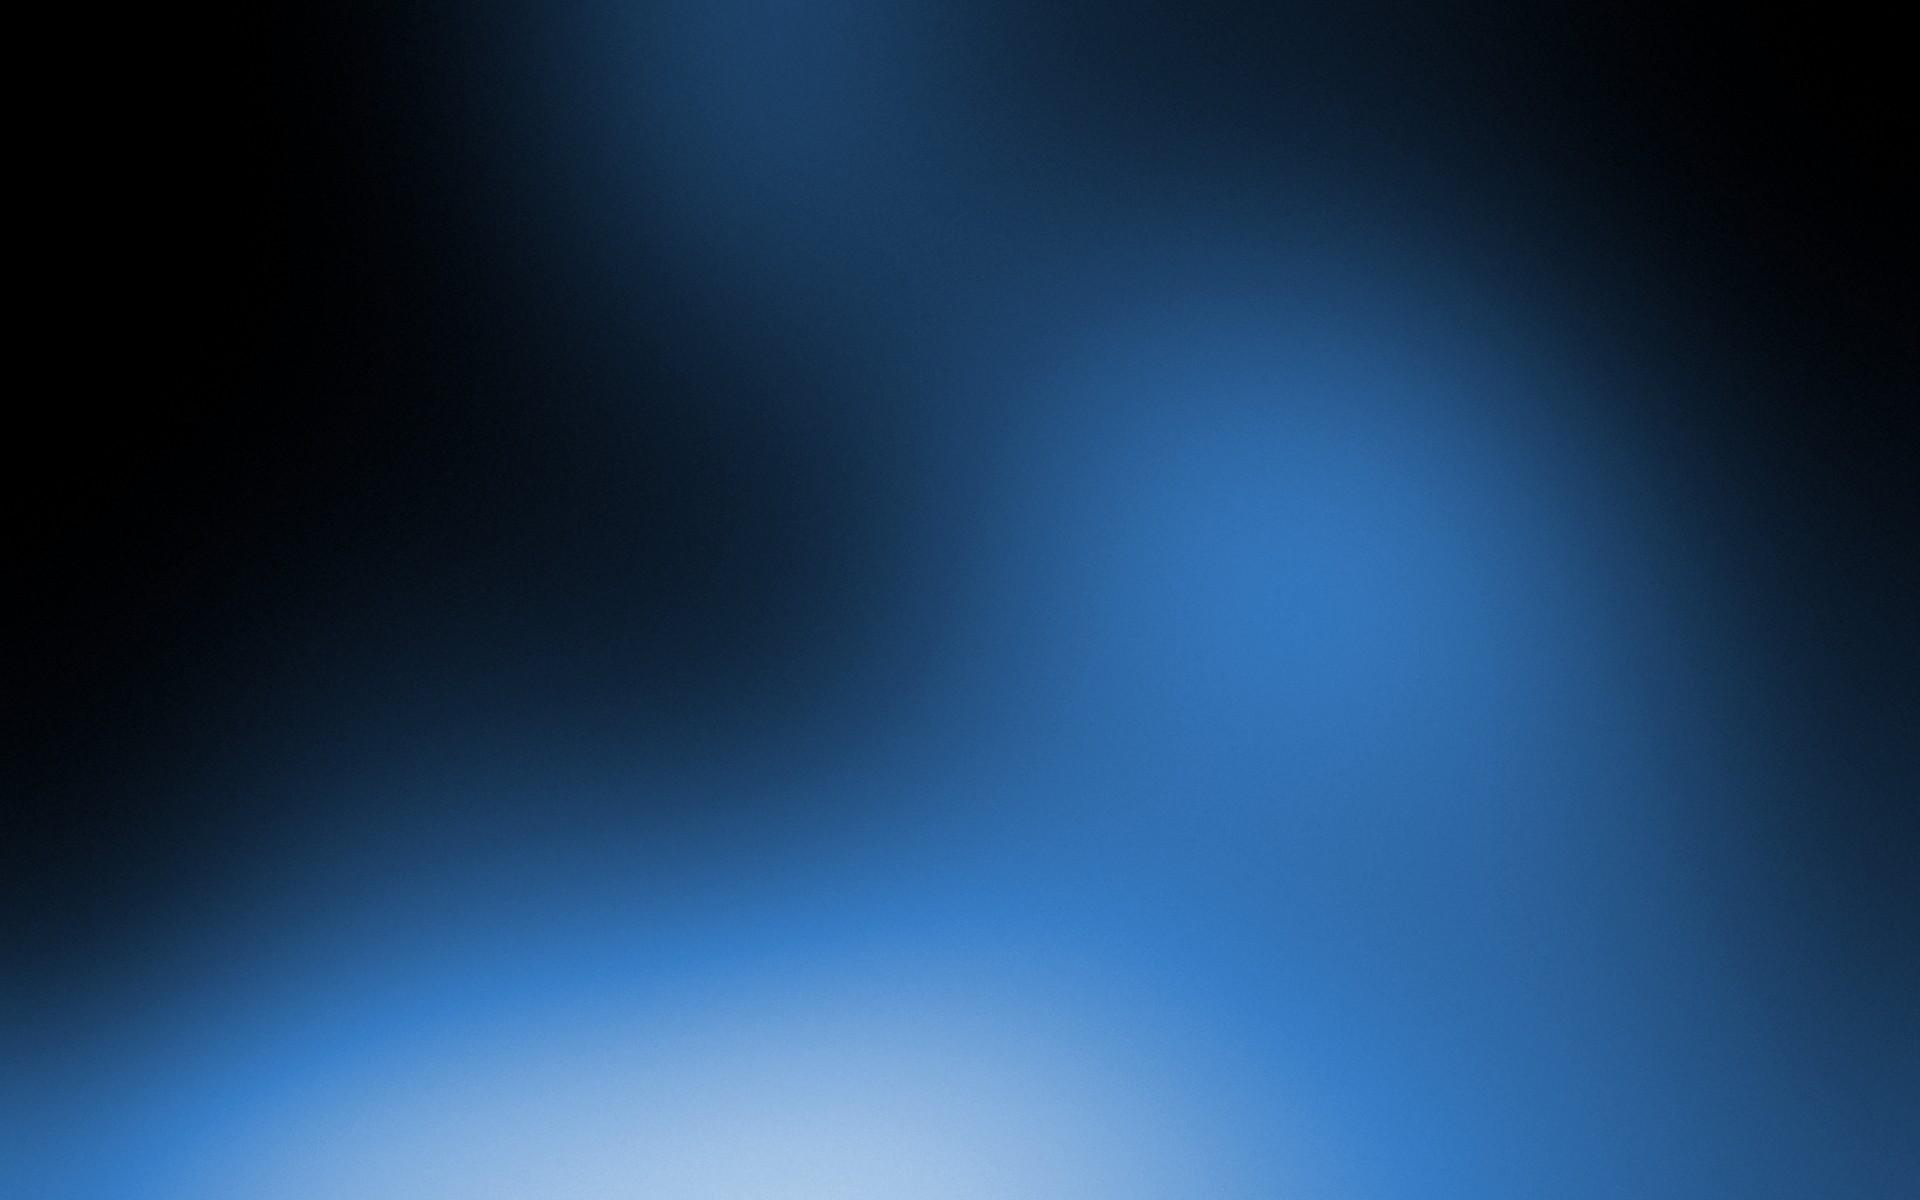 … Blue gradient